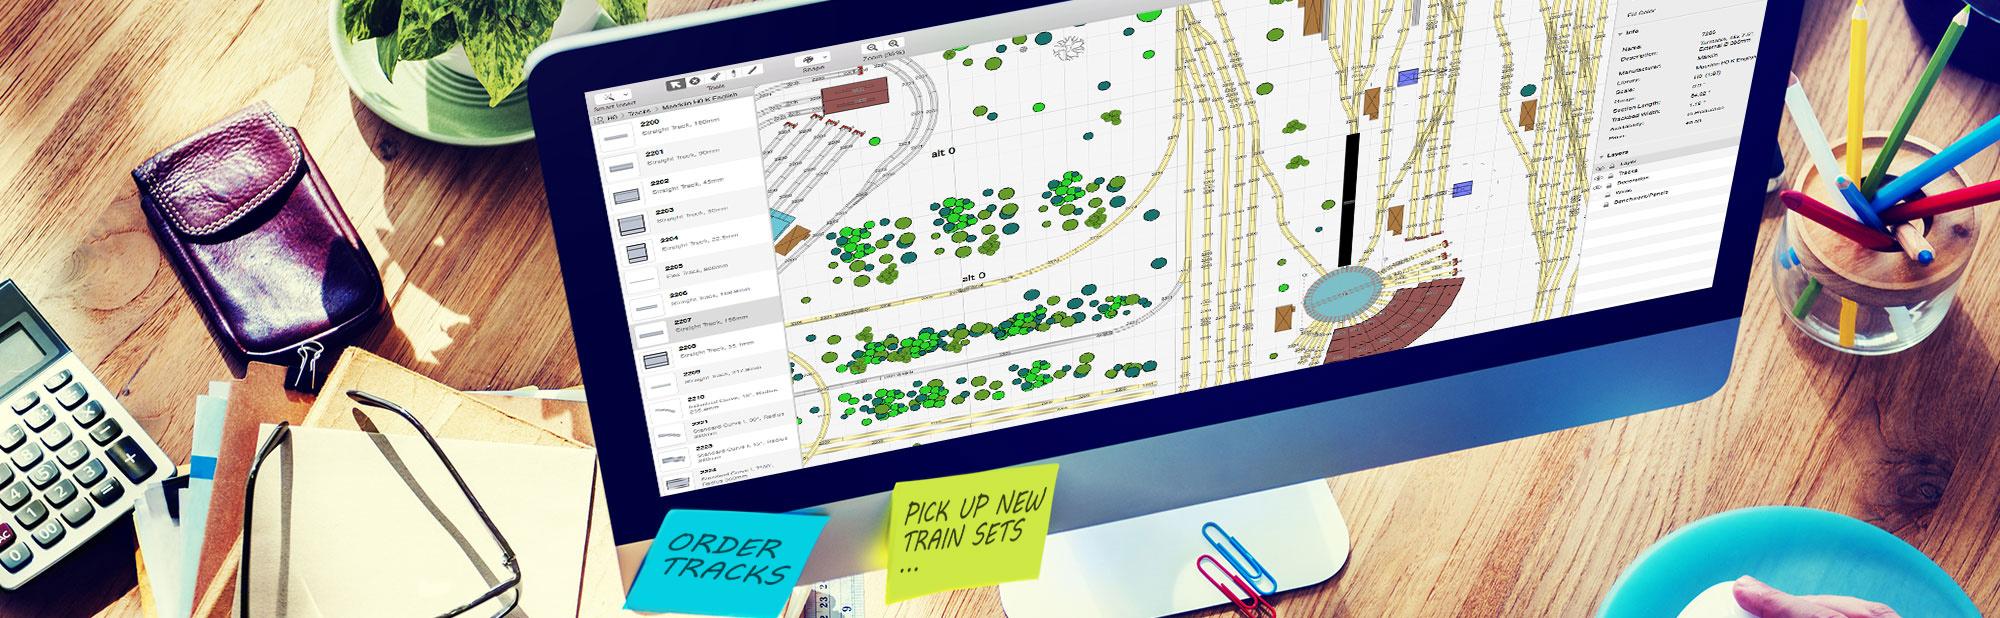 home railmodeller proRailmodeller Pro 6 Nu Community Layouts #14